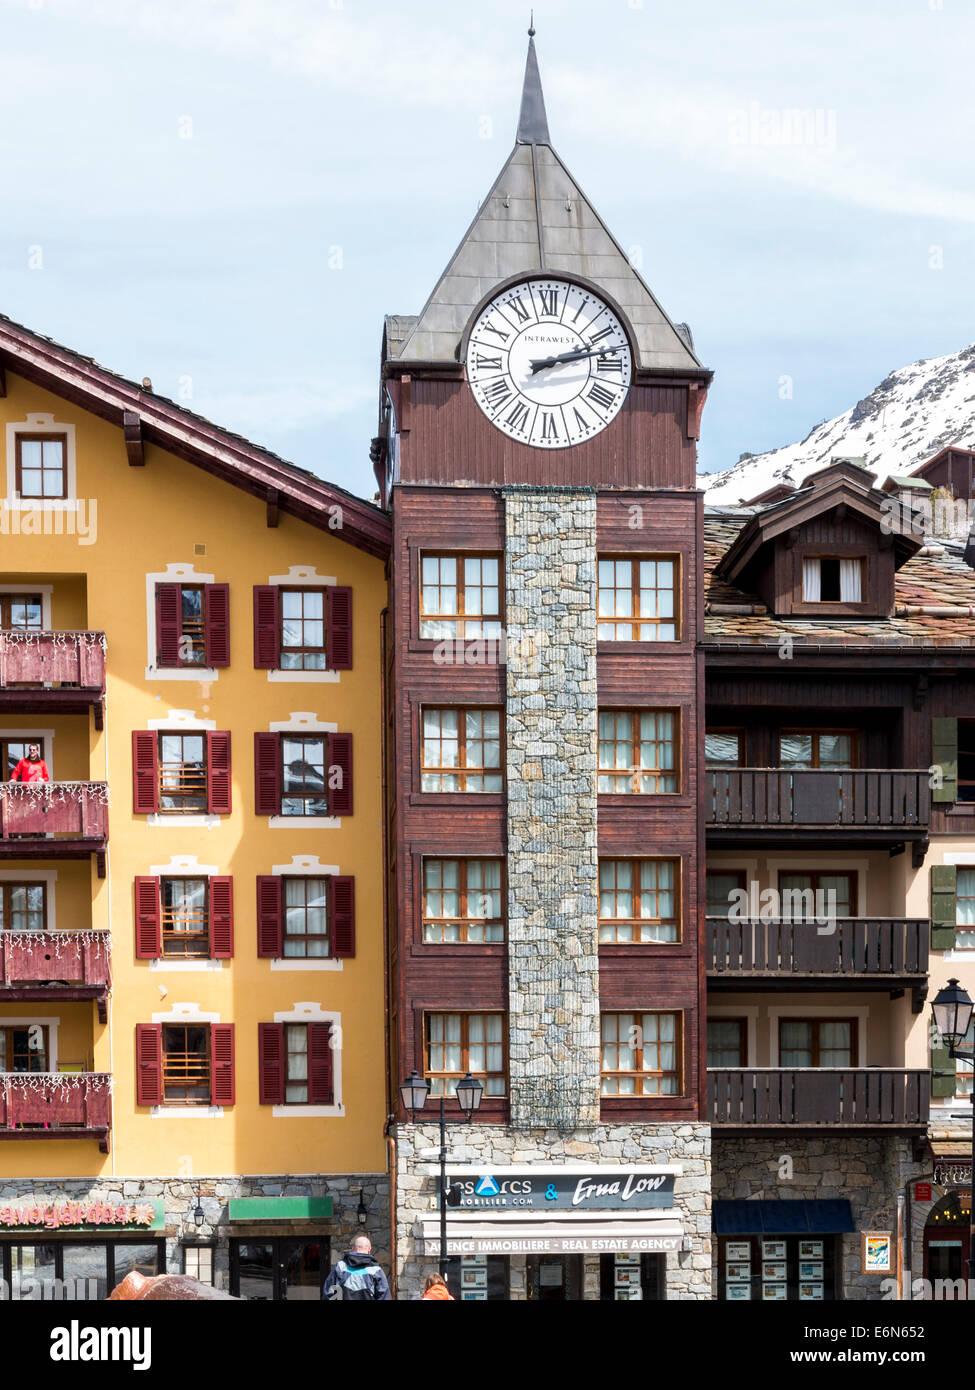 Building in Les Arcs 1850, Savoie, Rhone Alpes, France - Stock Image